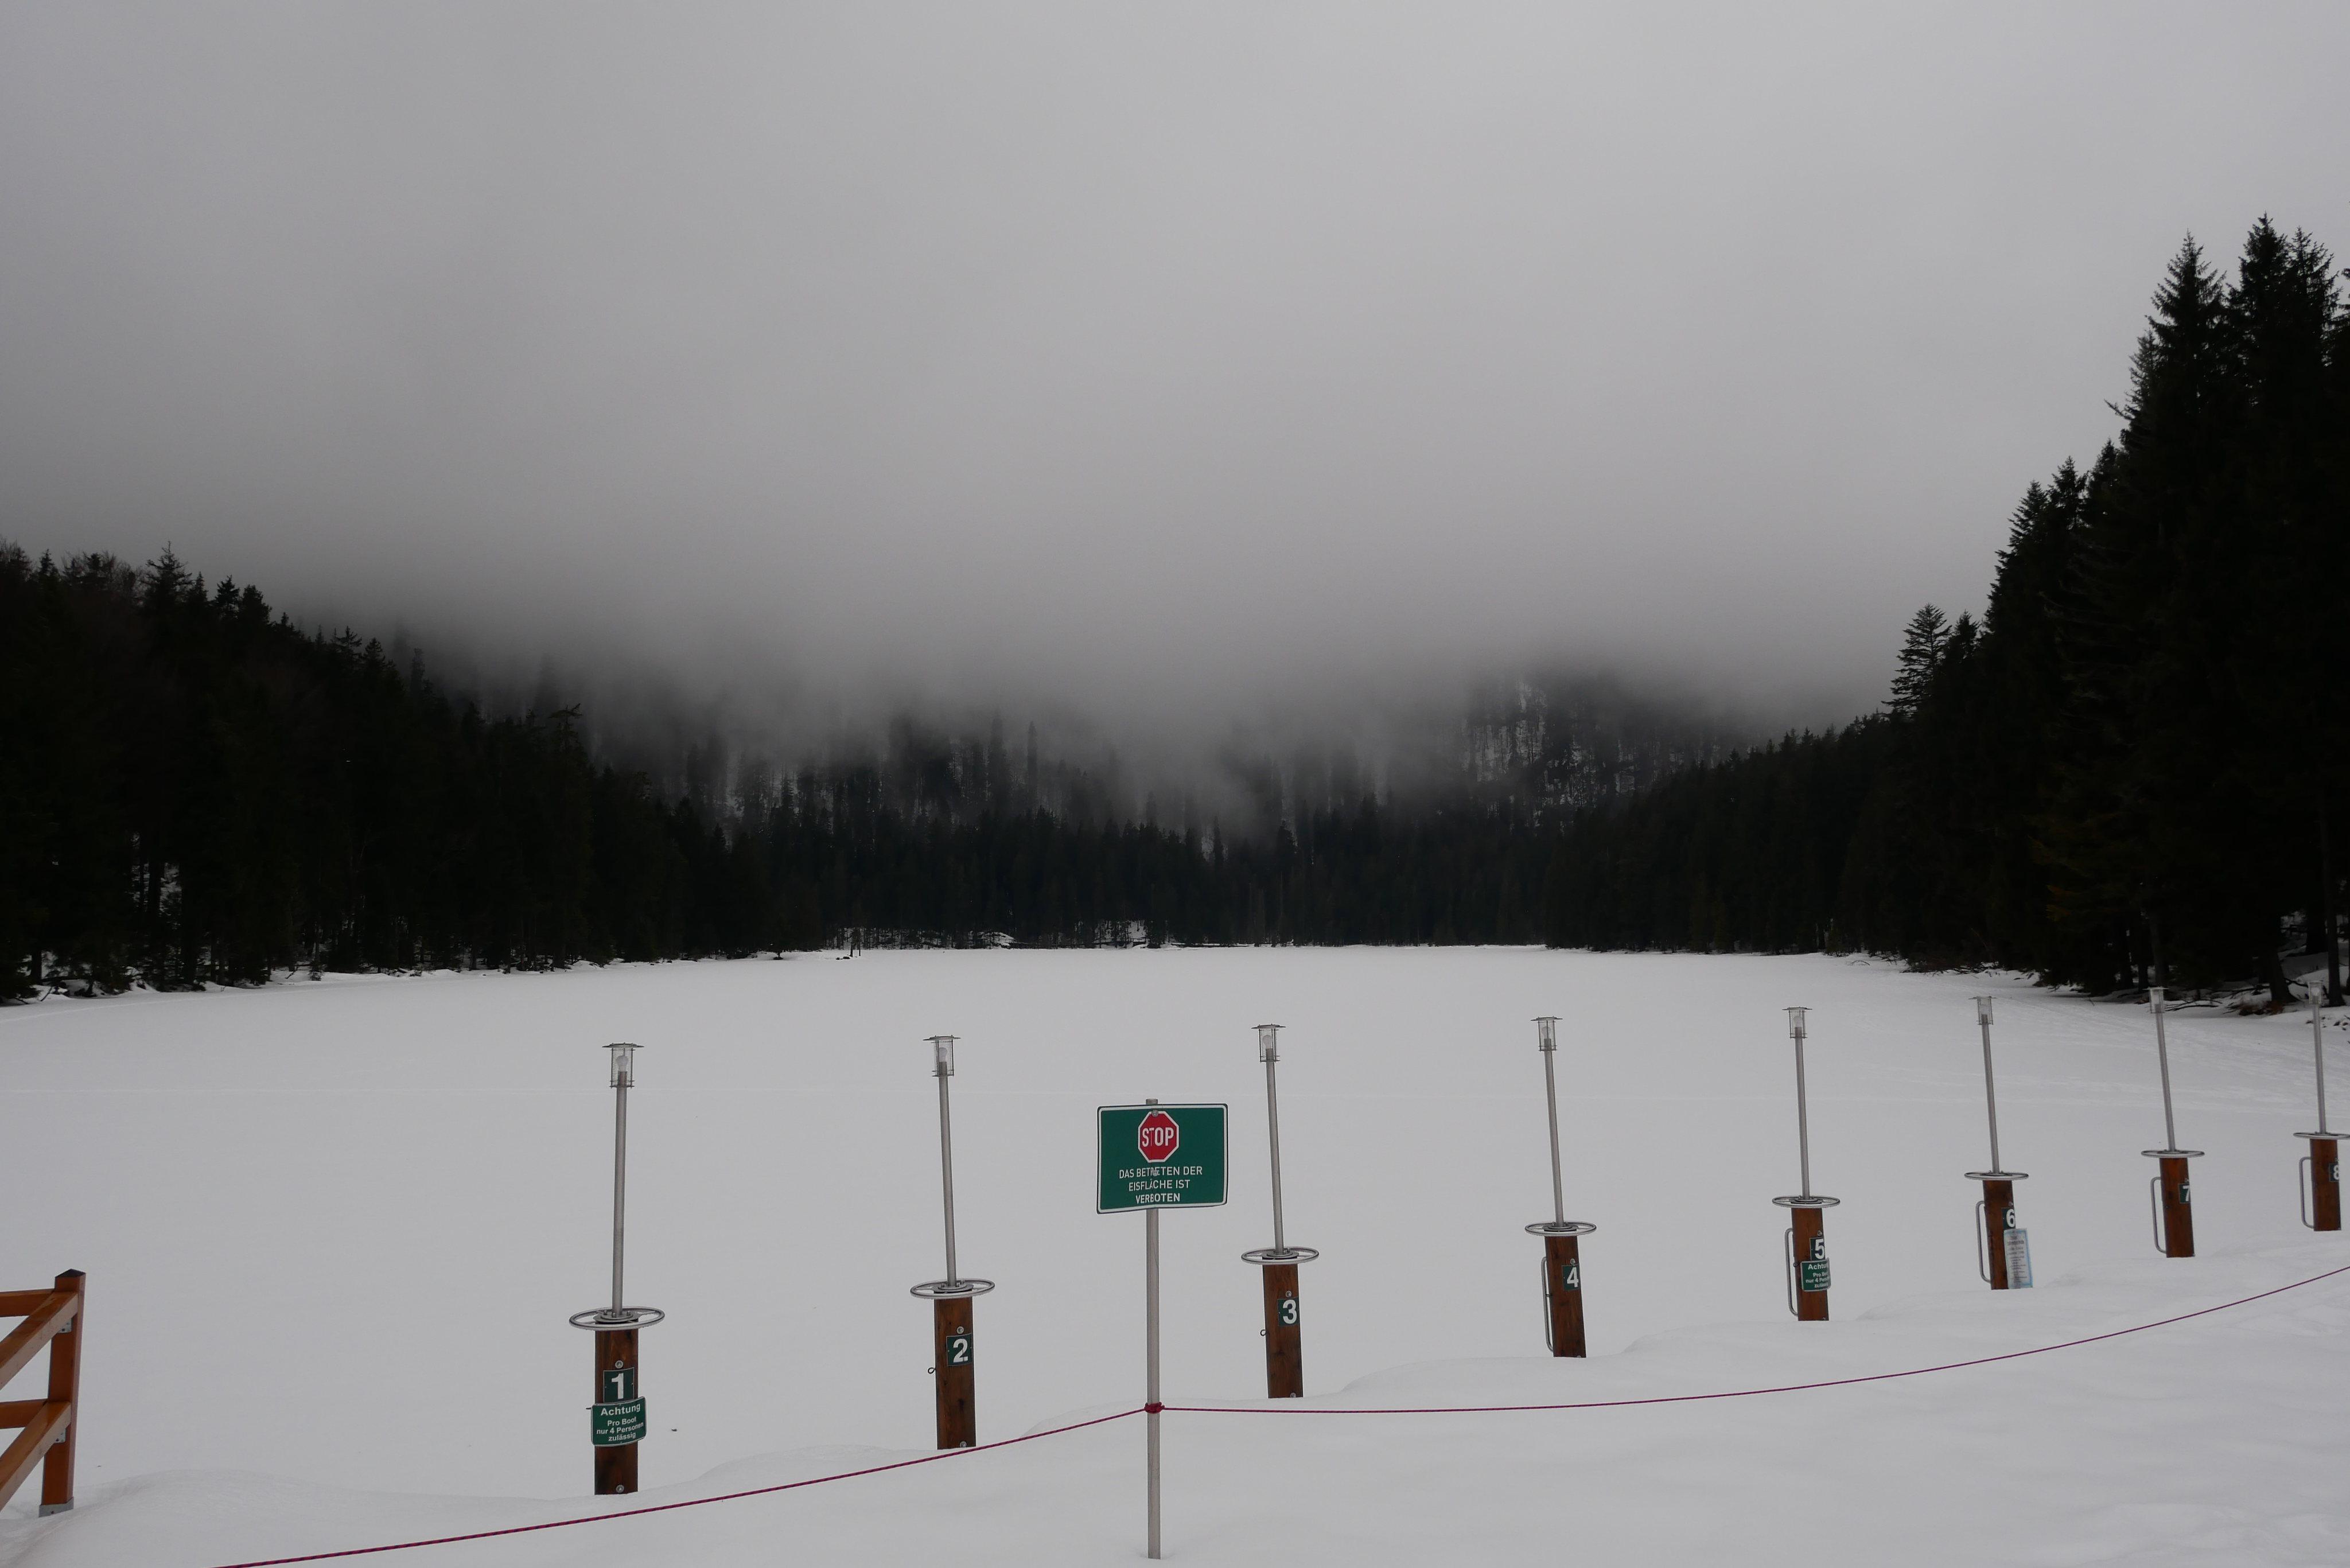 leil.de/di/pics/arbersee_im_winter_21.jpg